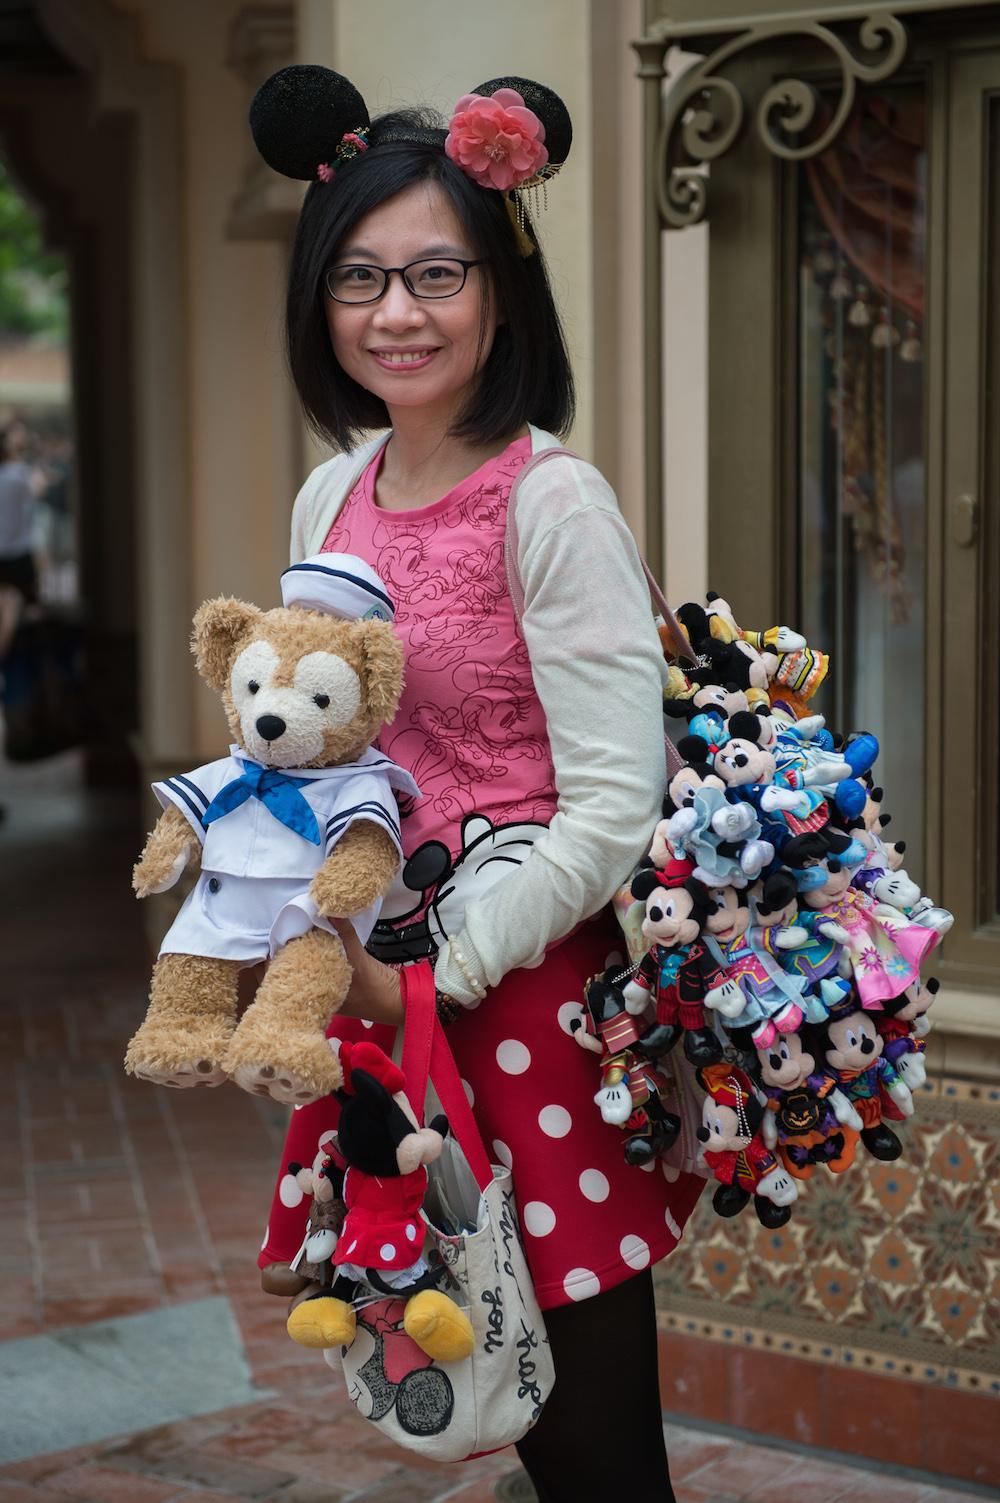 Disney Fashion For Everyone: The Fabulous Shanghai Disney Fashion Trends We Love